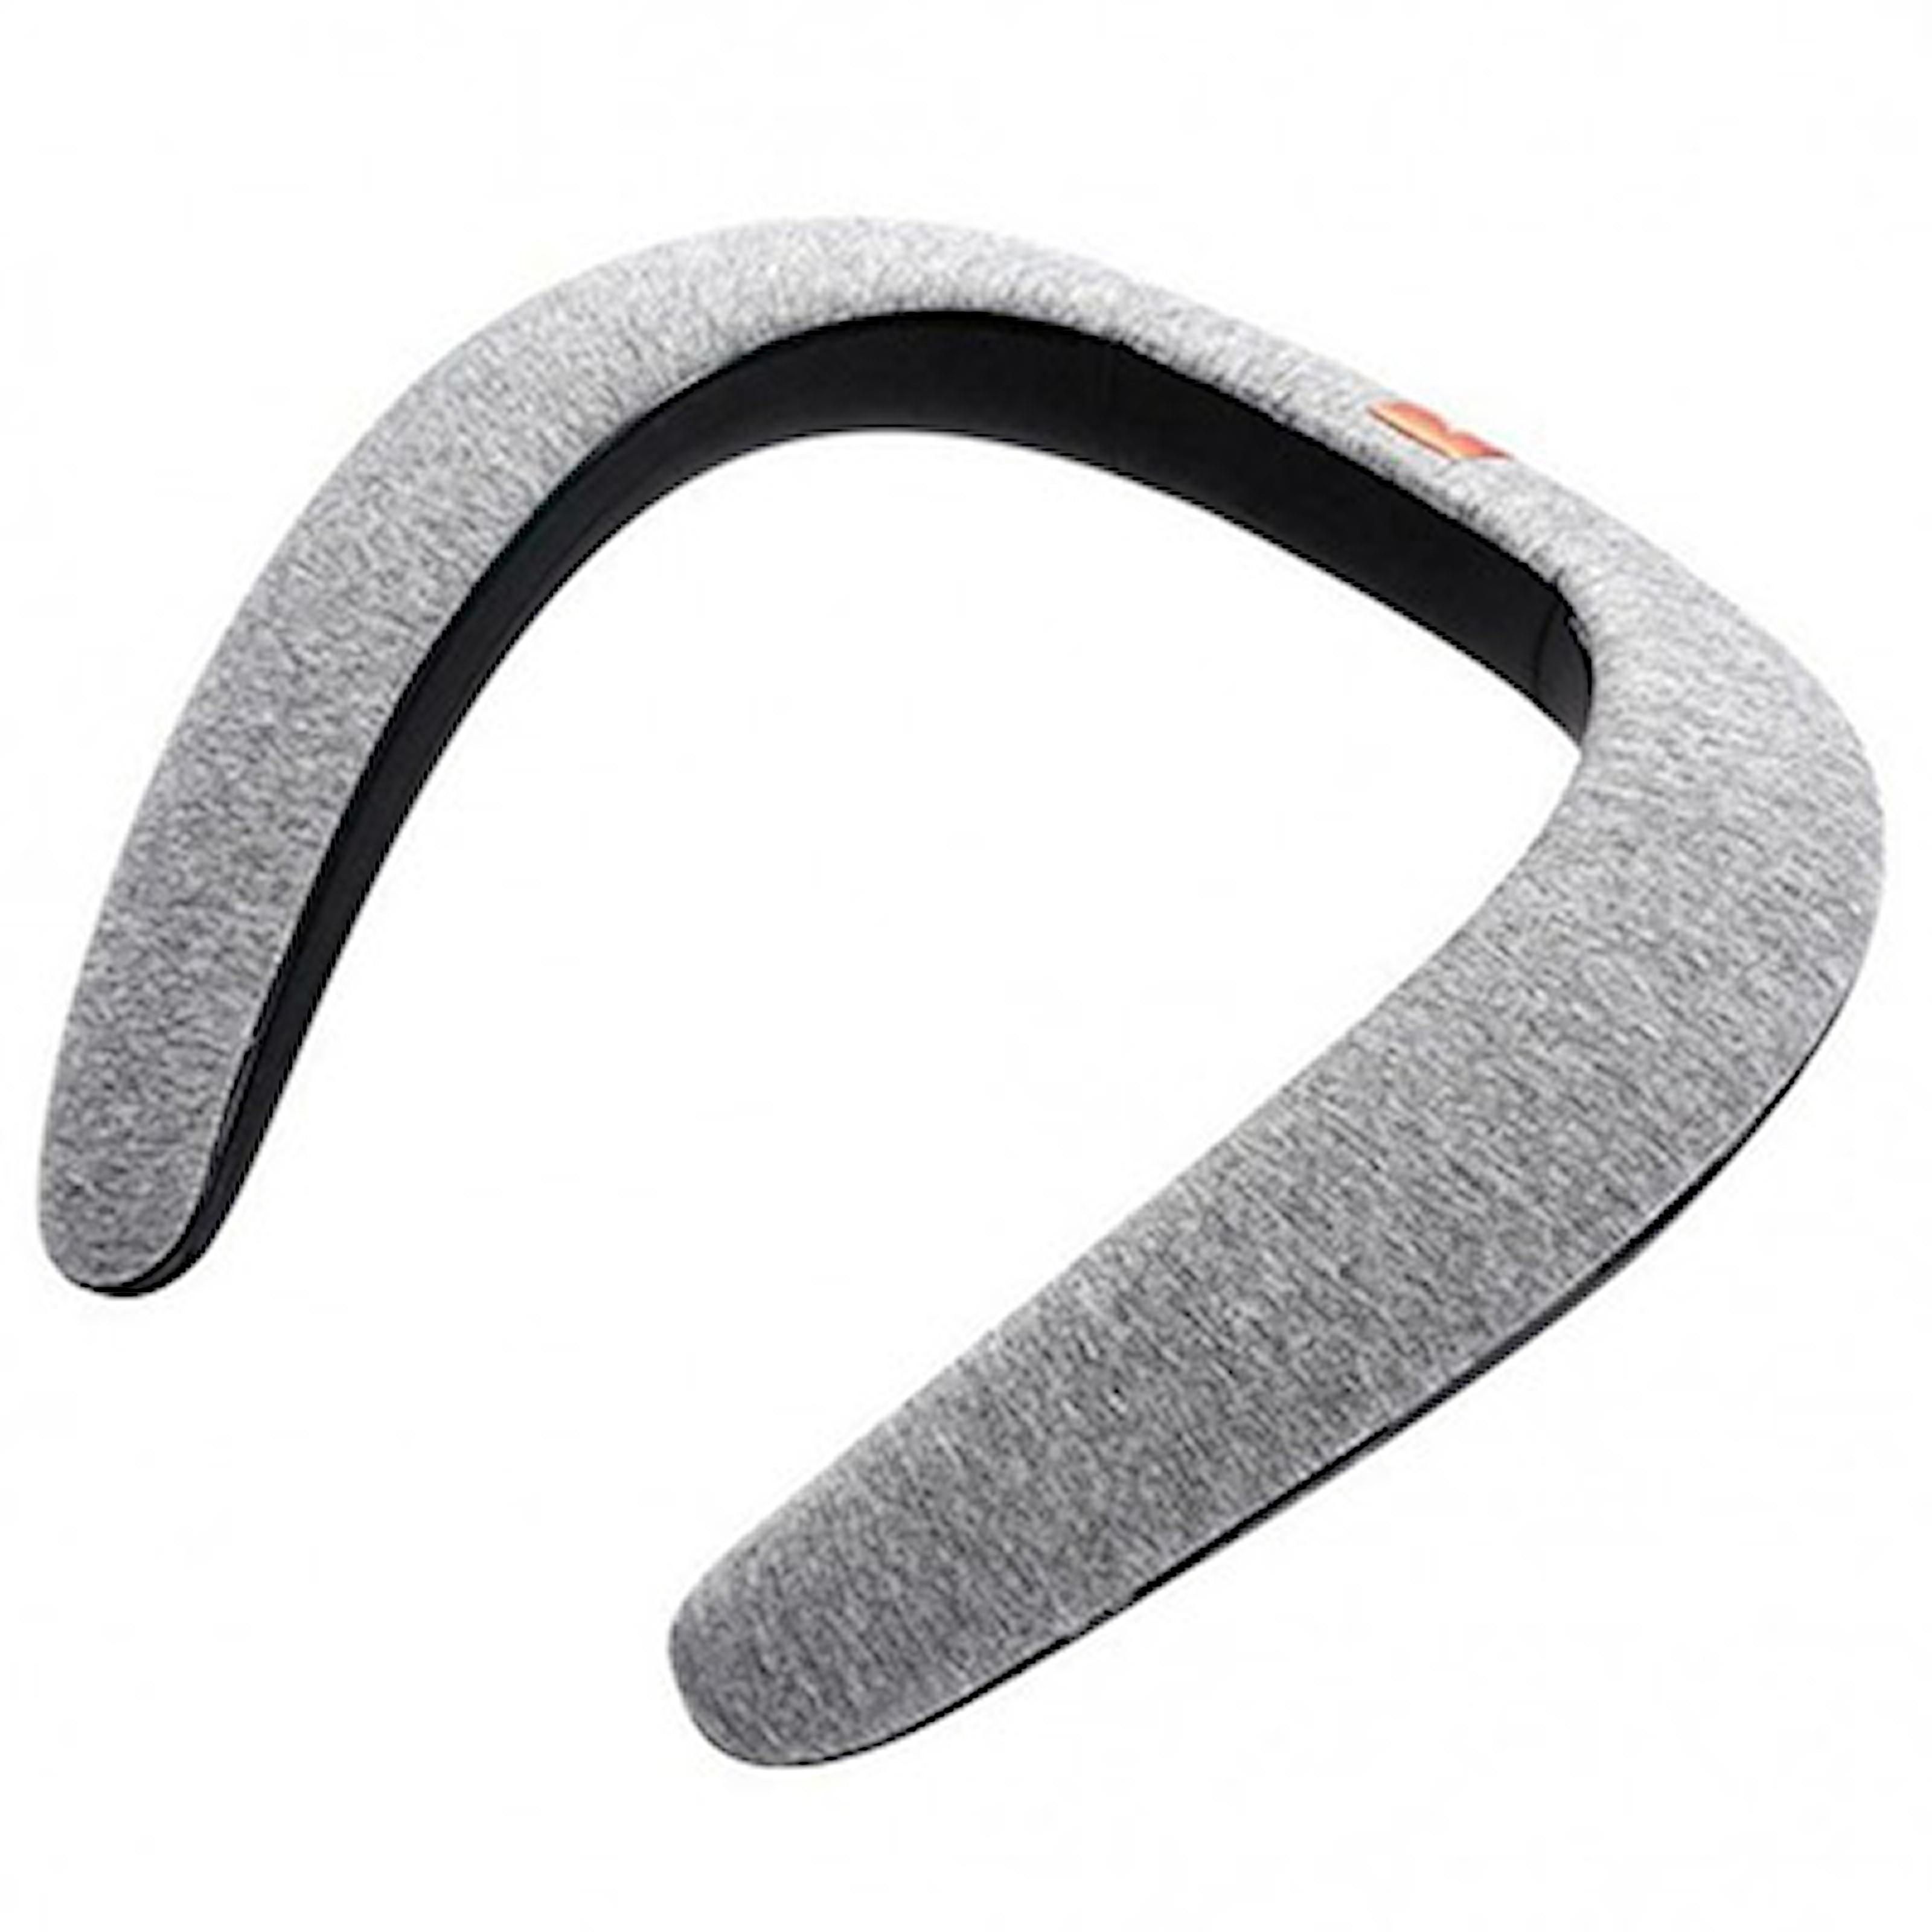 Grå, Portable Neck Bluetooth Speaker, Trådløs Bluetooth-høyttaler, ,